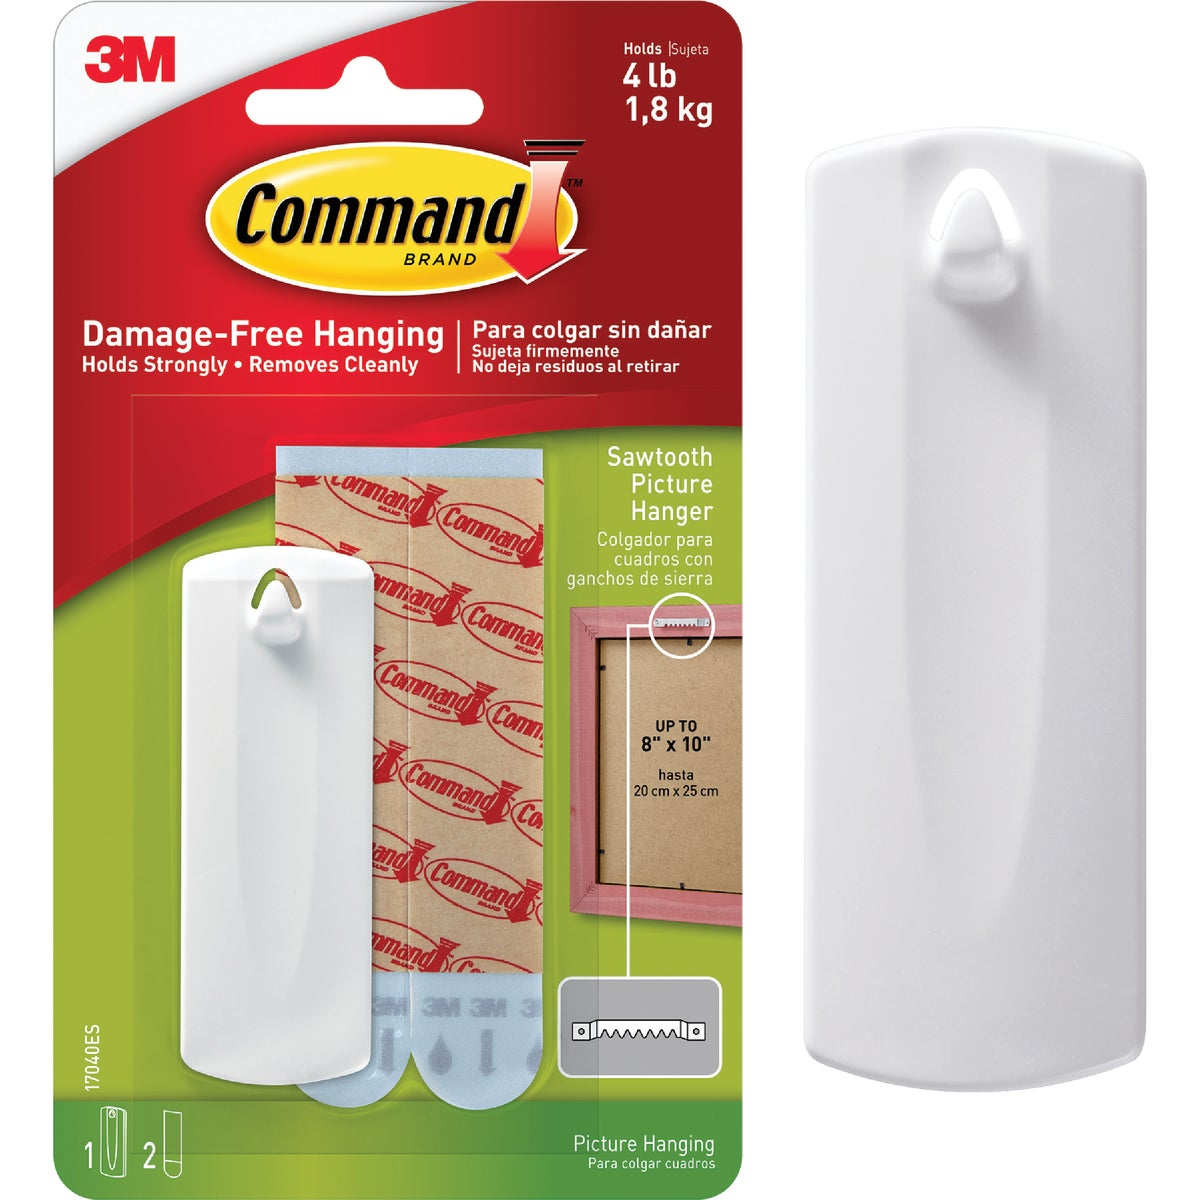 3M COMMAND PICTURE HANGER 17040